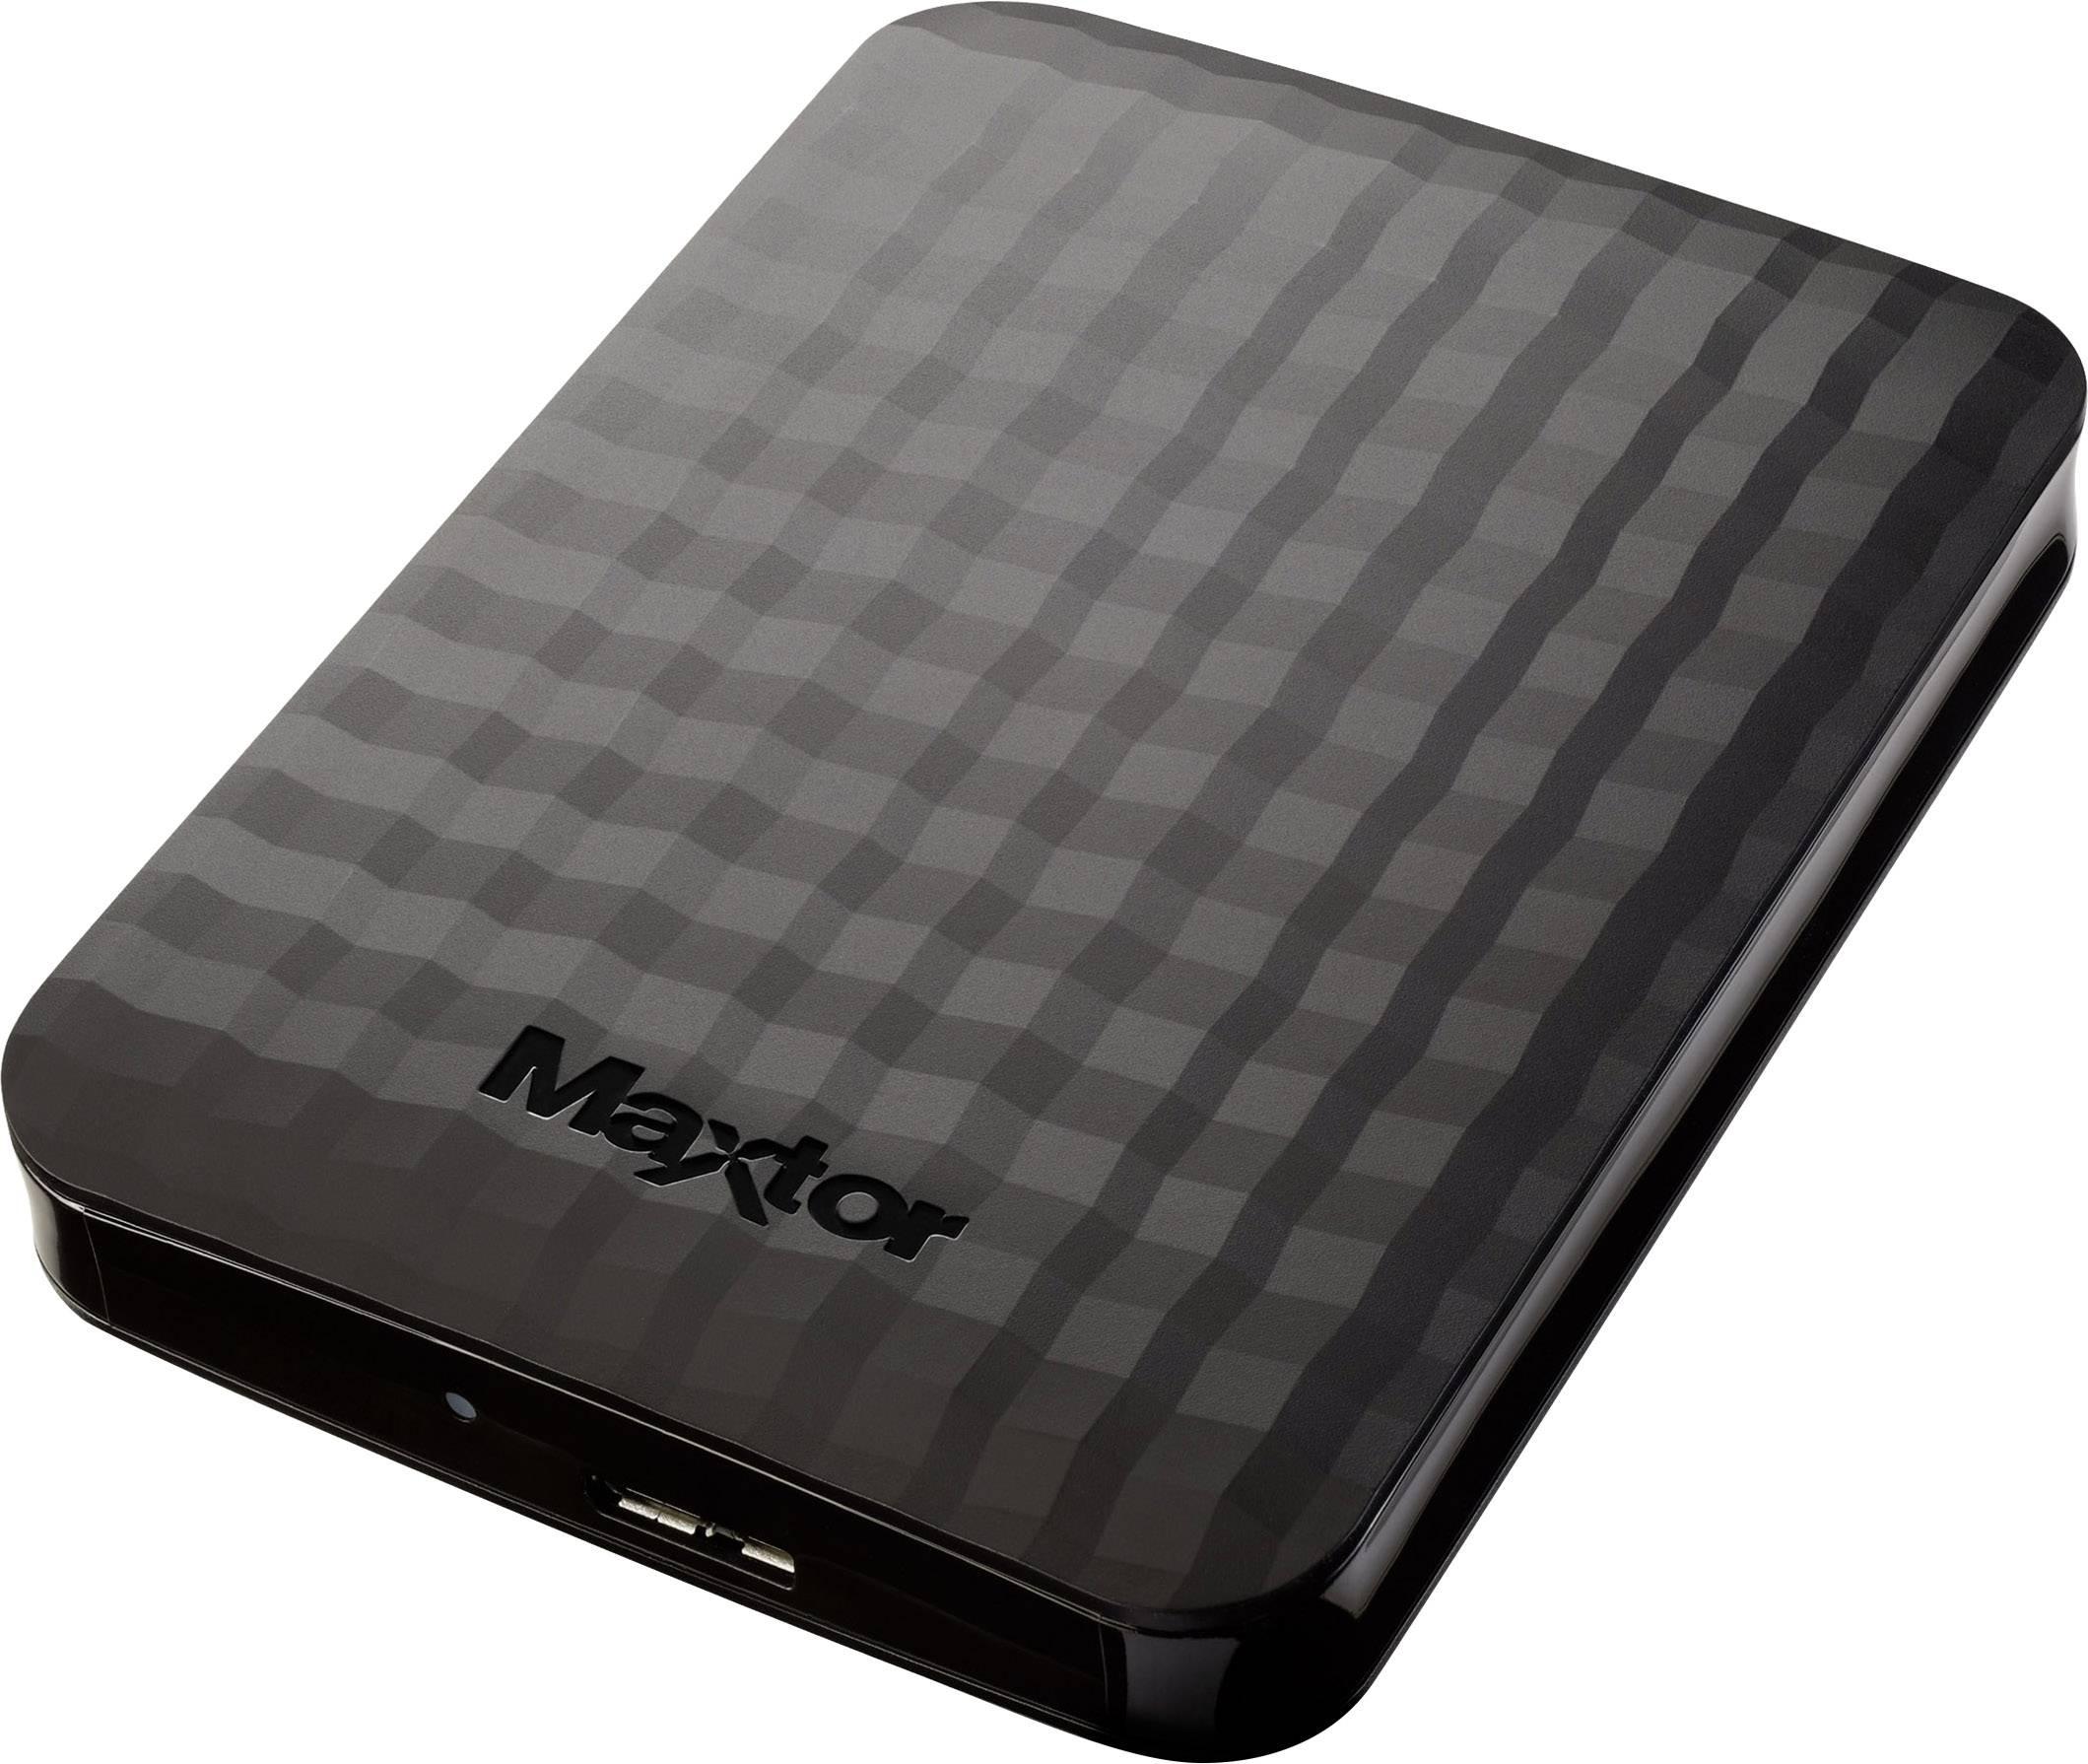 "Externí HDD 6,35 cm (2,5"") Maxtor M3 Portable, 2 TB, USB 3.0, černá"